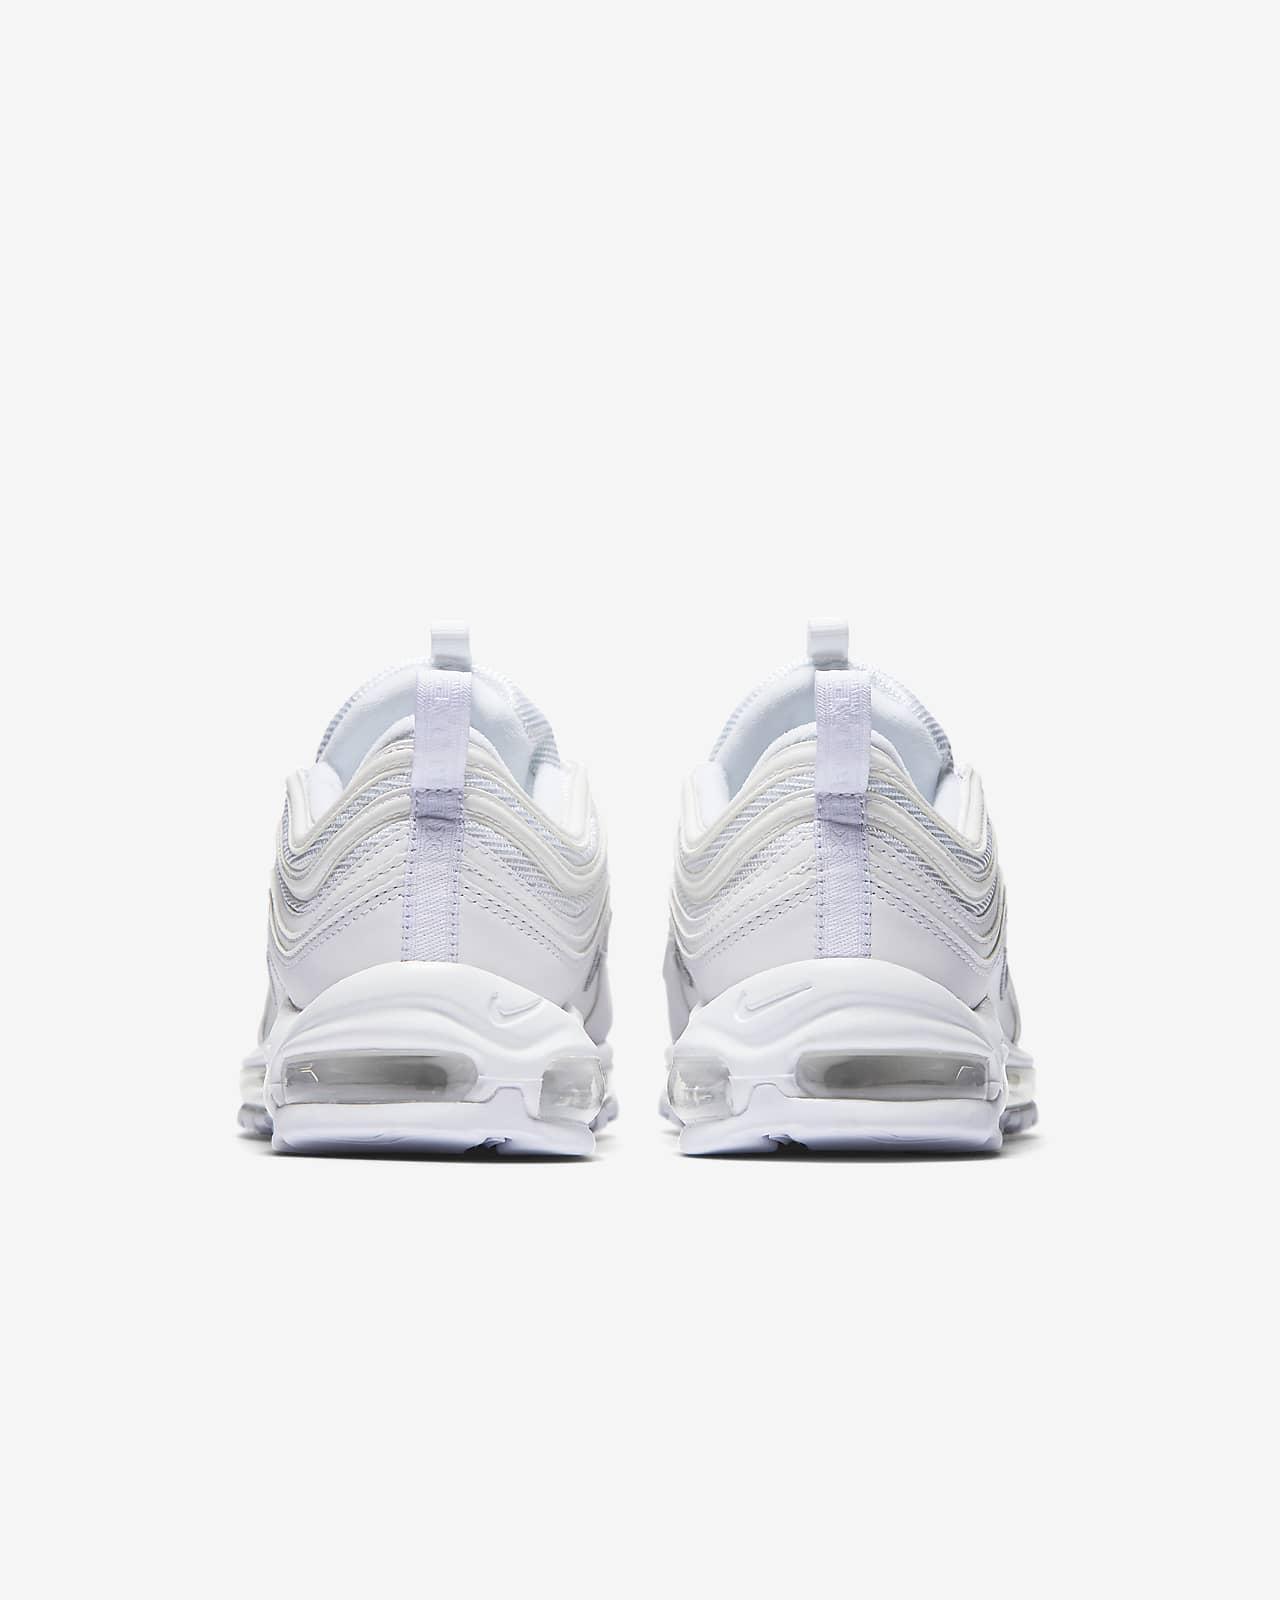 Chaussure Nike Air Max 97 pour Homme